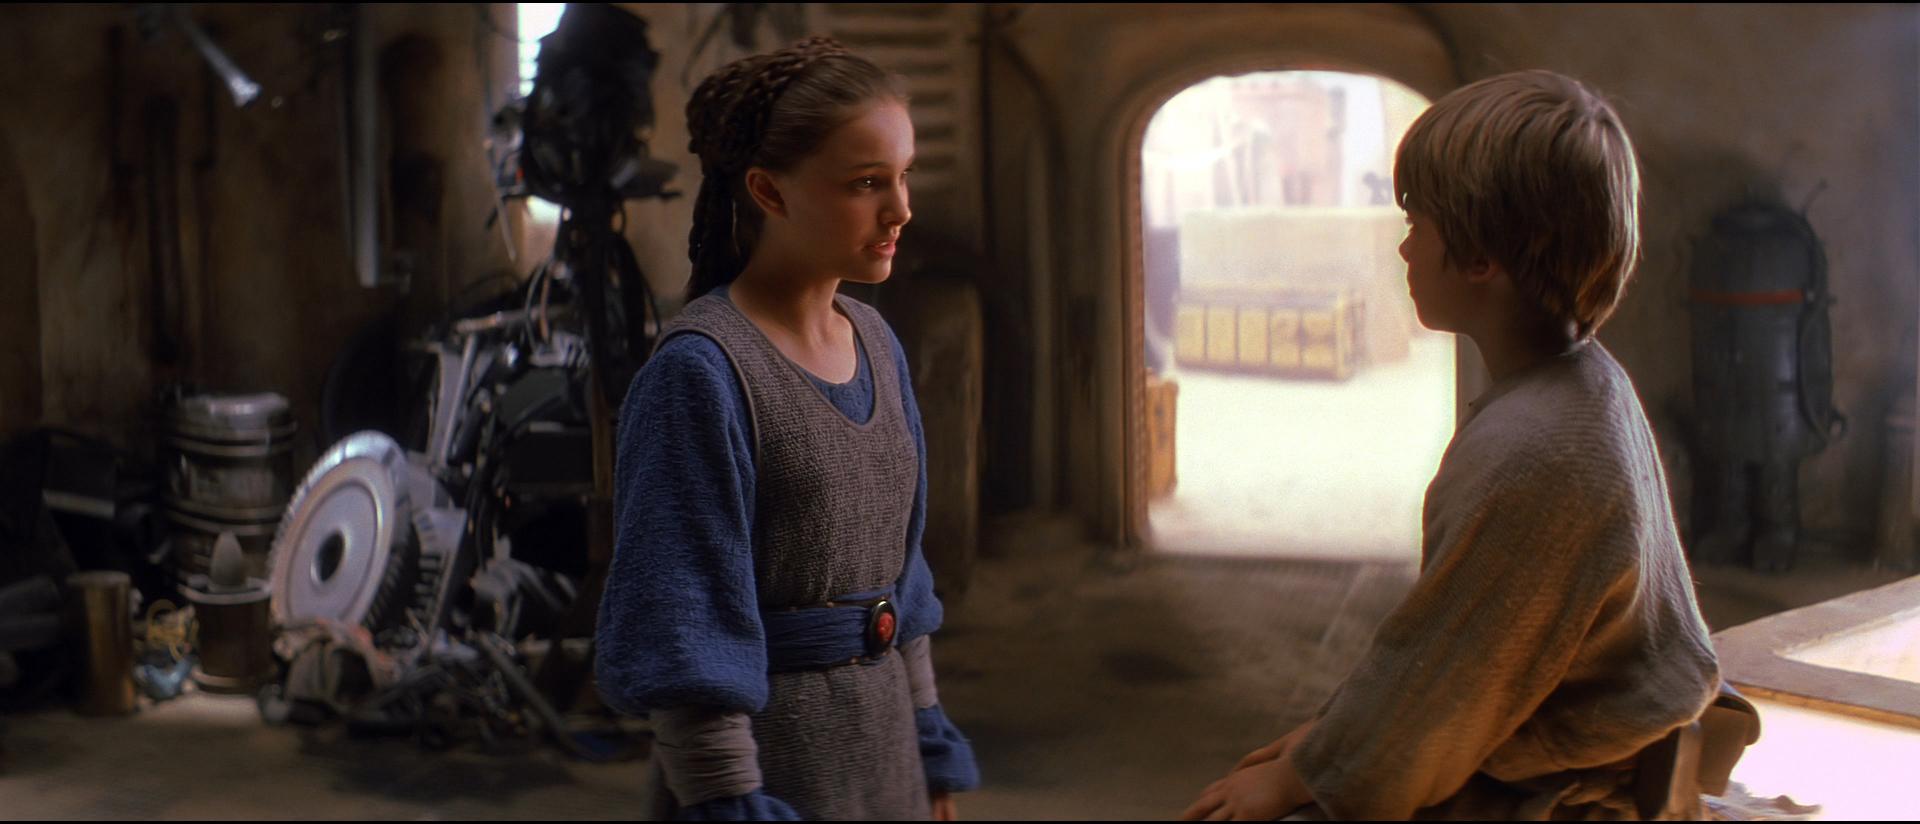 pic1-large Padme Amidala Home Planet on obi wan kenobi home, luke skywalker home, general grievous home, queen amidala home, princess amidala home,